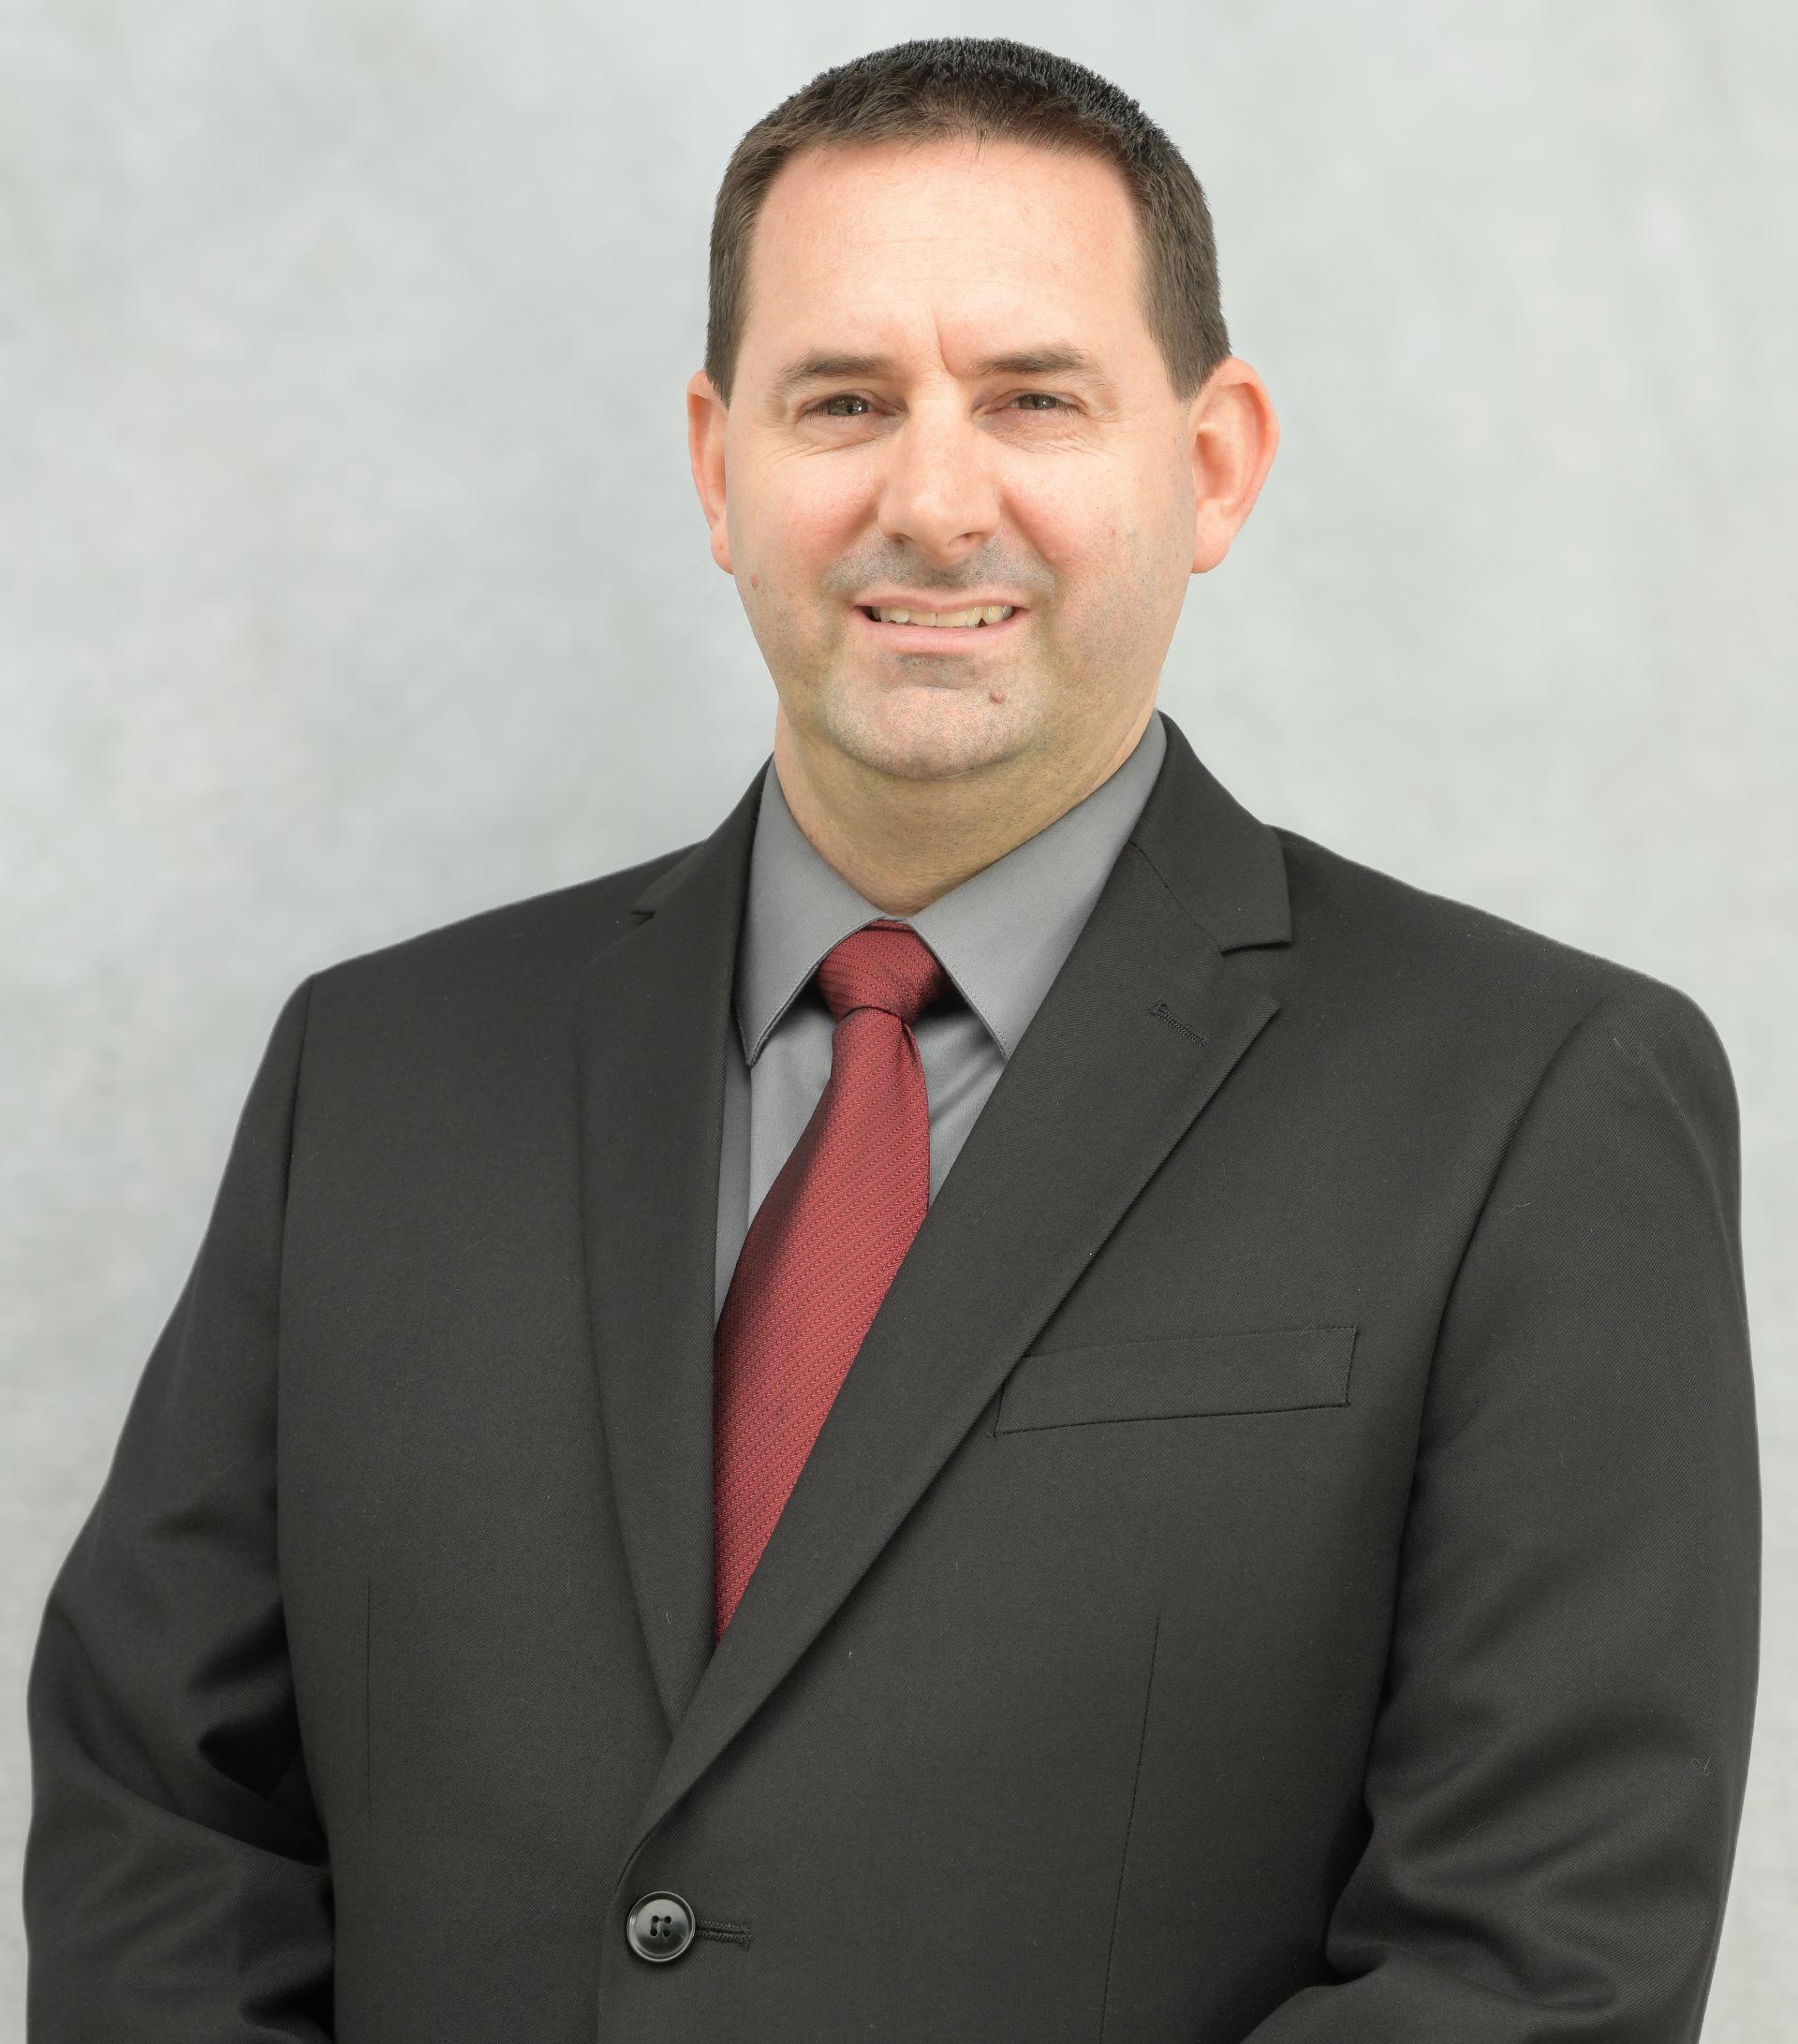 Allstate Personal Financial Representative: Andy Cole